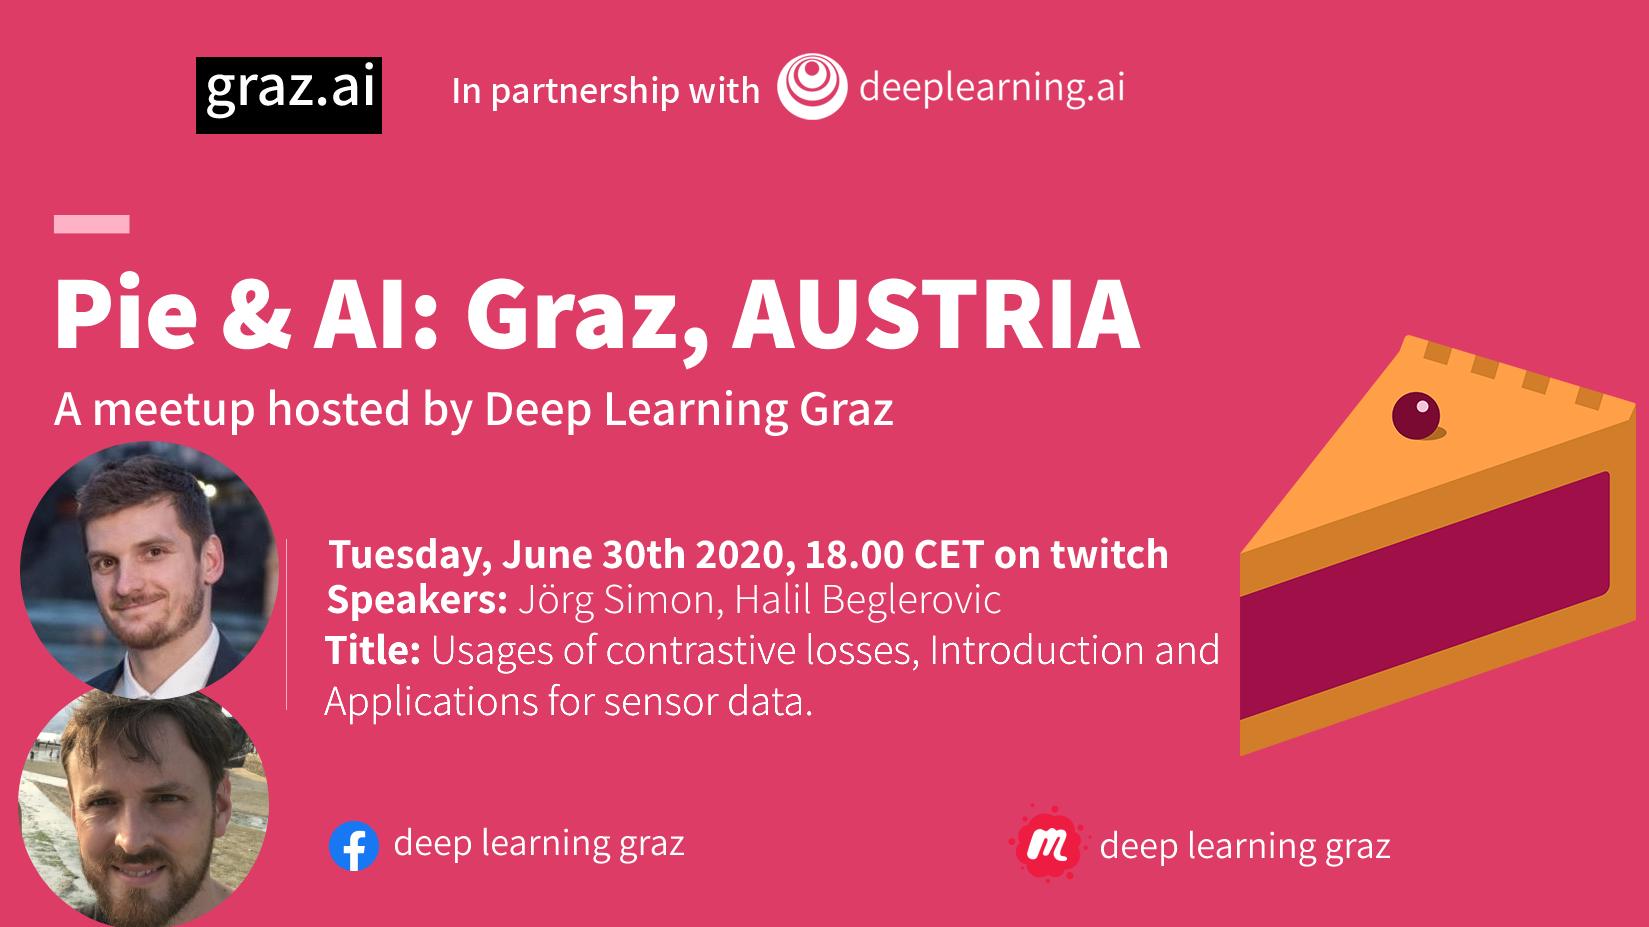 Pie & AI: Graz, AUSTRIA Tuesday, June 30th 2020, 18.00 CET on twitch